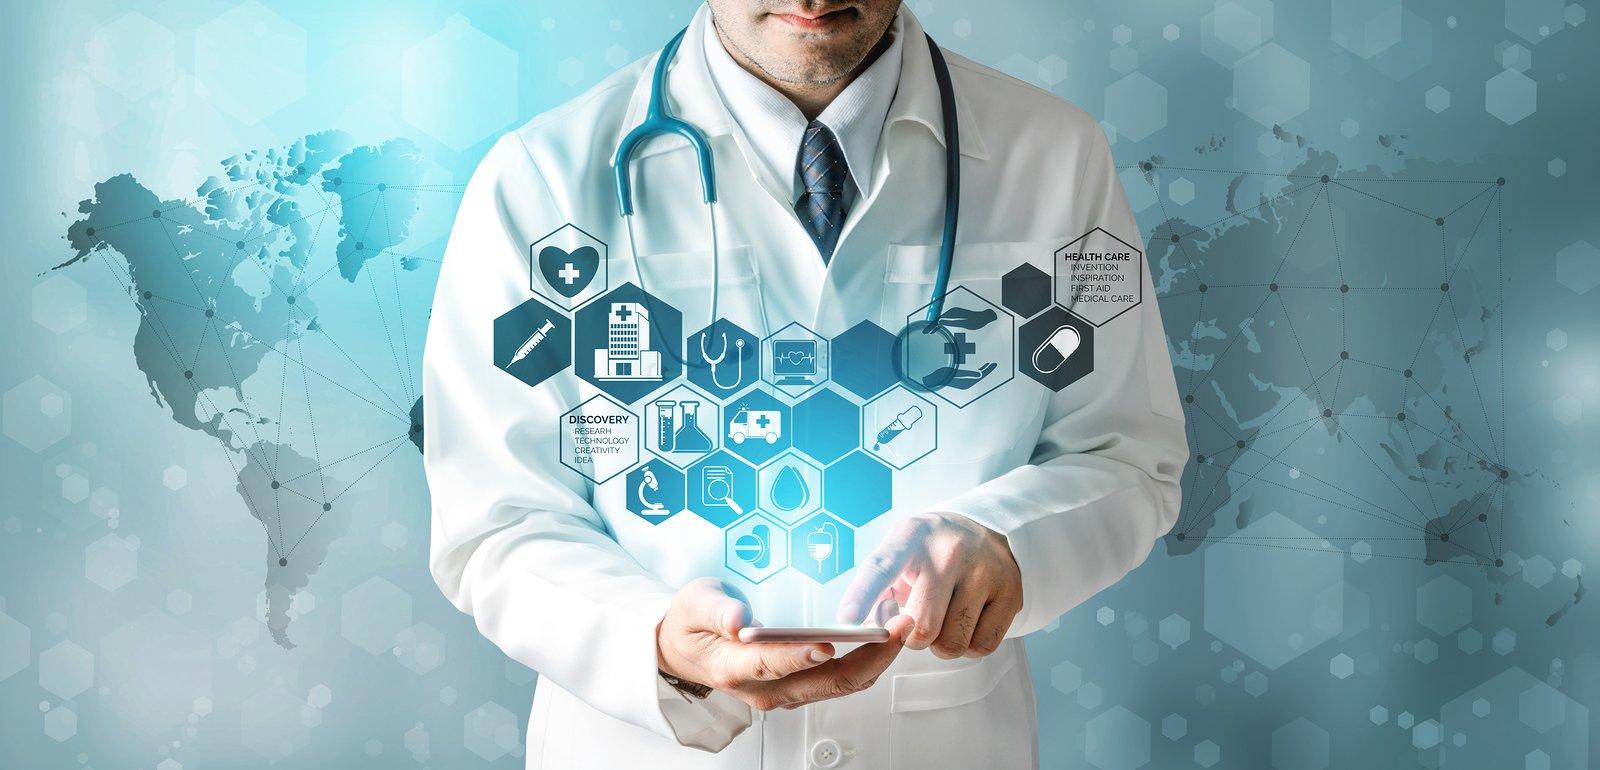 Healthcare industry - meet Xerox ConnectKey - your new best friend.